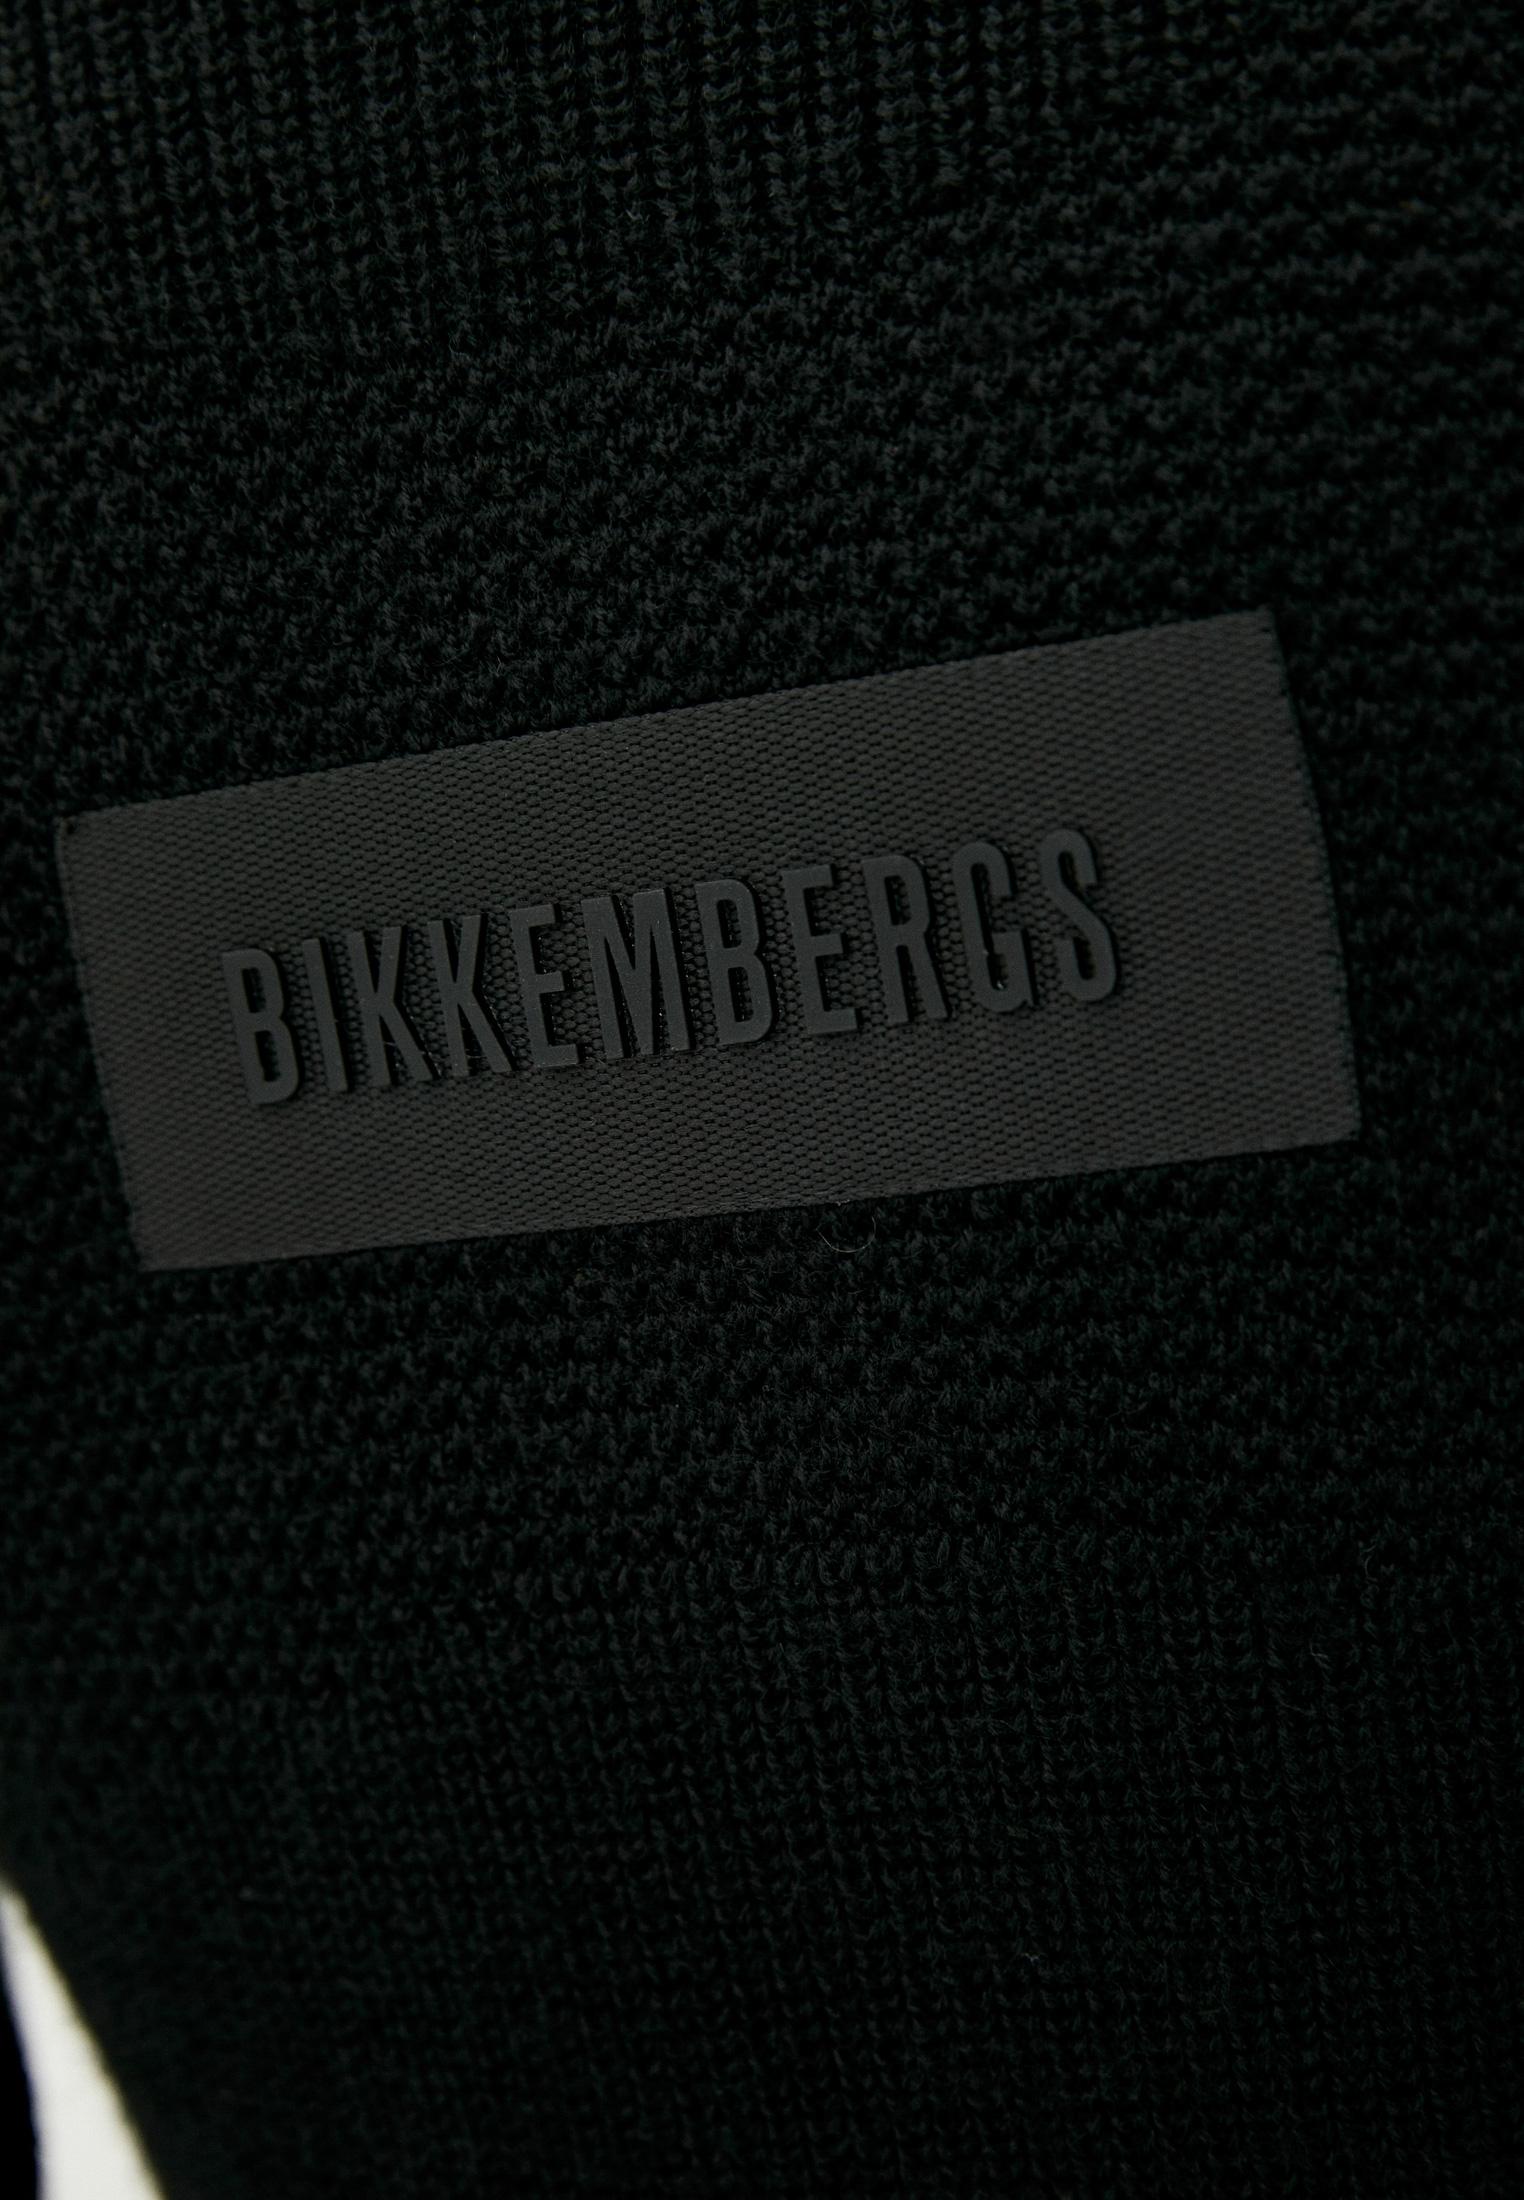 Кардиган Bikkembergs (Биккембергс) C S J21 10 X 1368: изображение 5